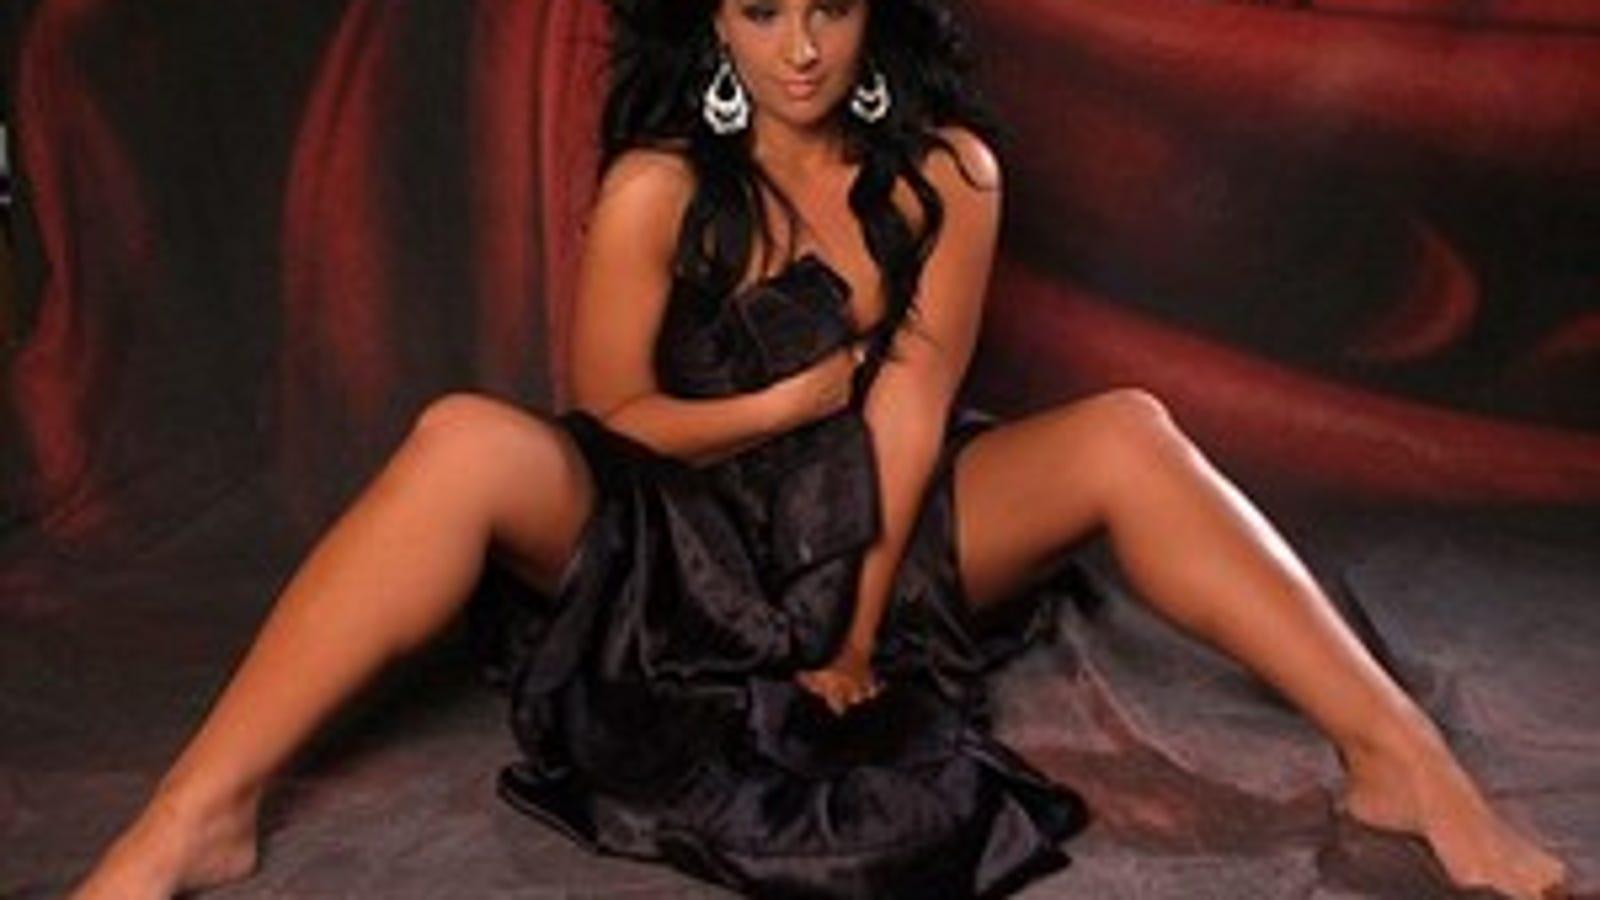 Natalie dylan losing virginity pics